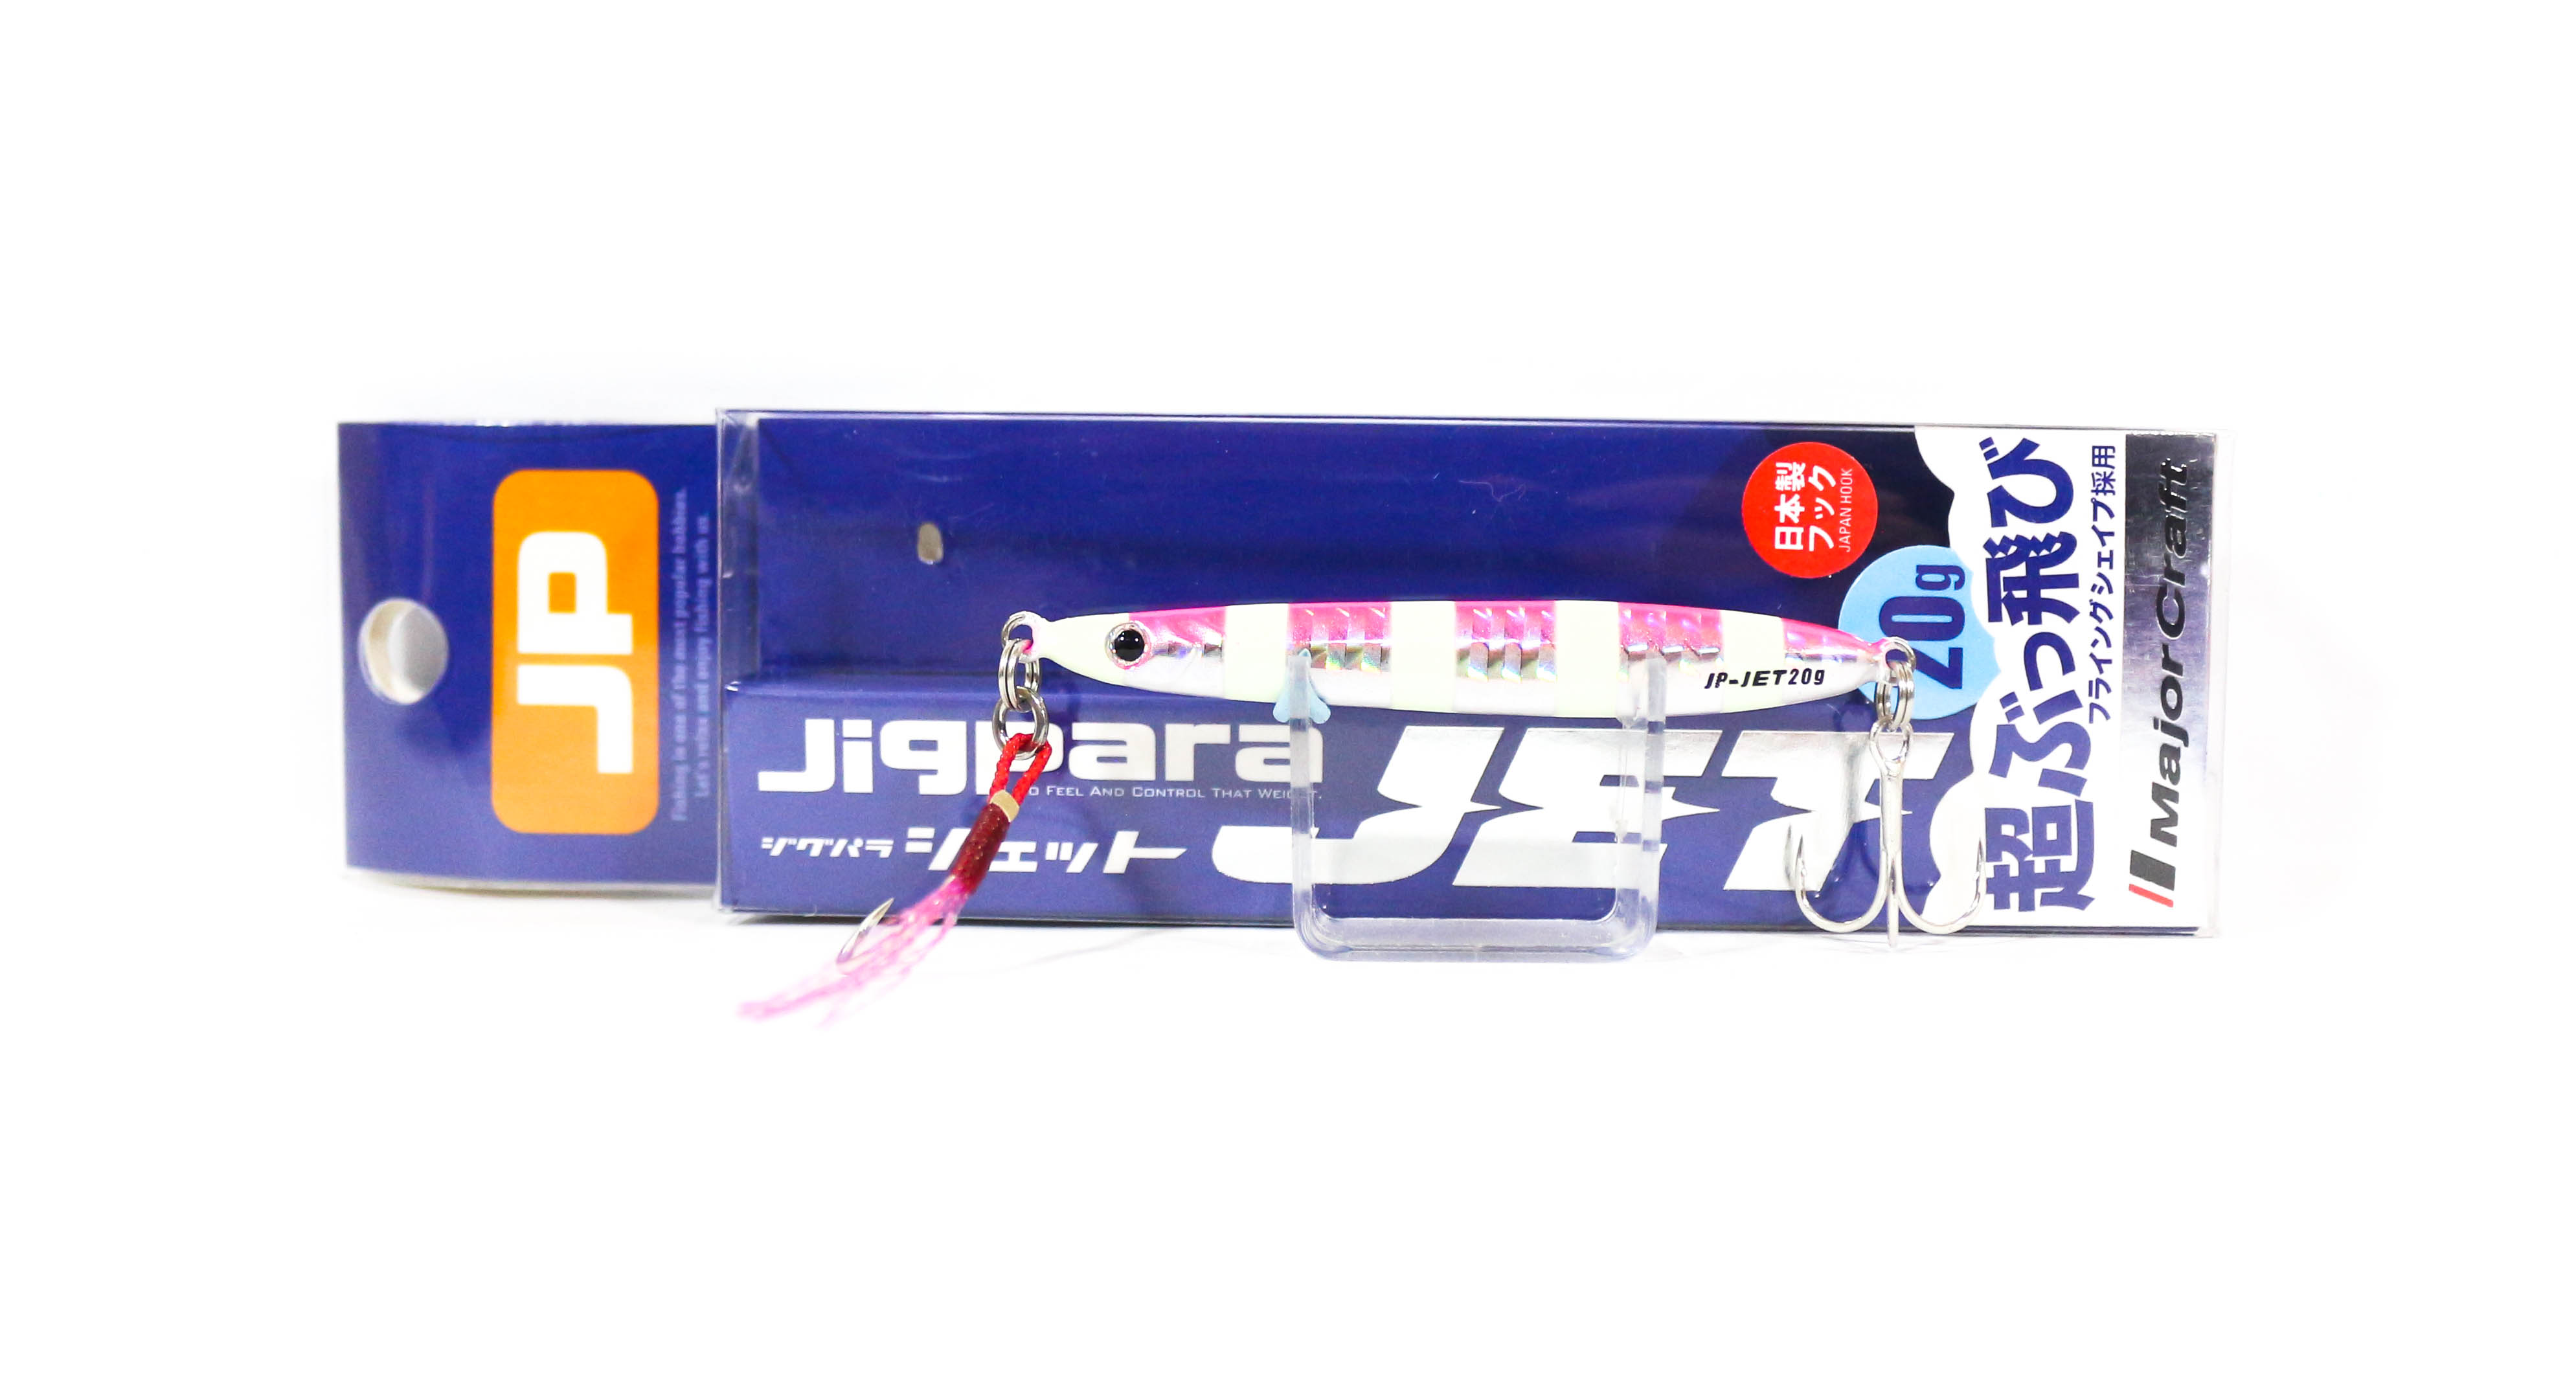 Major Craft Metal Jig Jigpara Jet JPS-JET 20 grams 026 (6387)